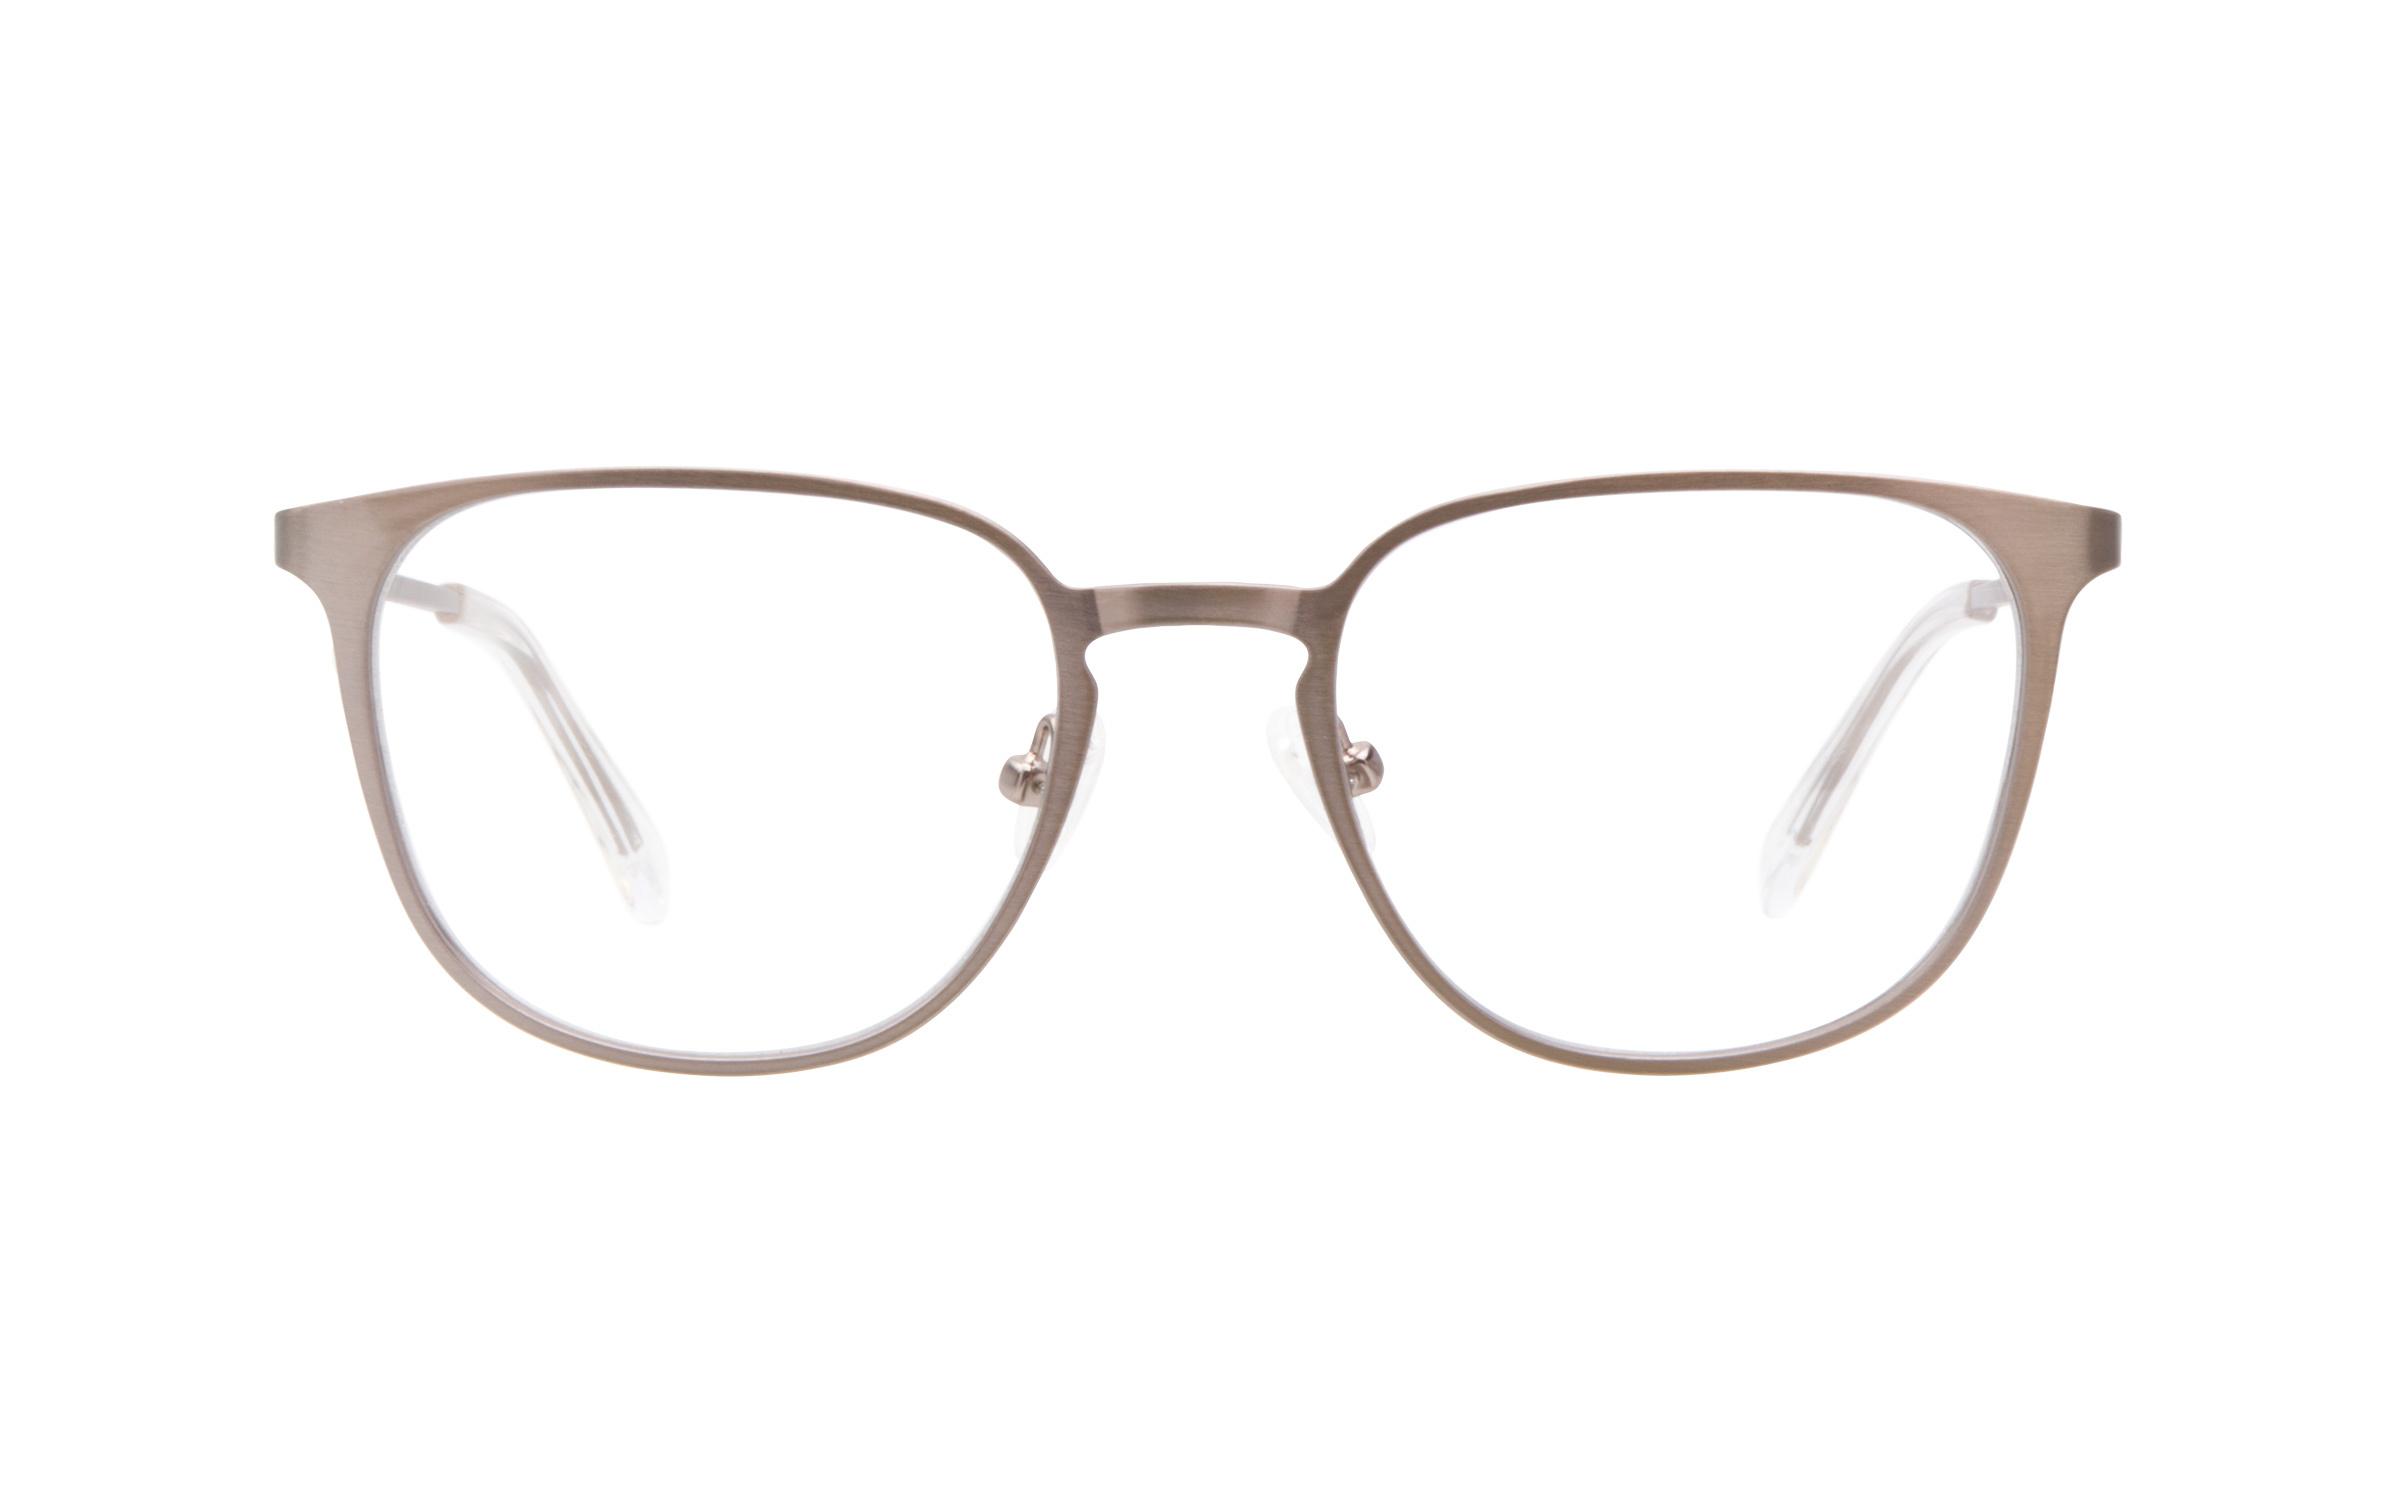 http://www.coastal.com/ - Men's Vintage Glasses Silver Joseph Marc Online Coastal